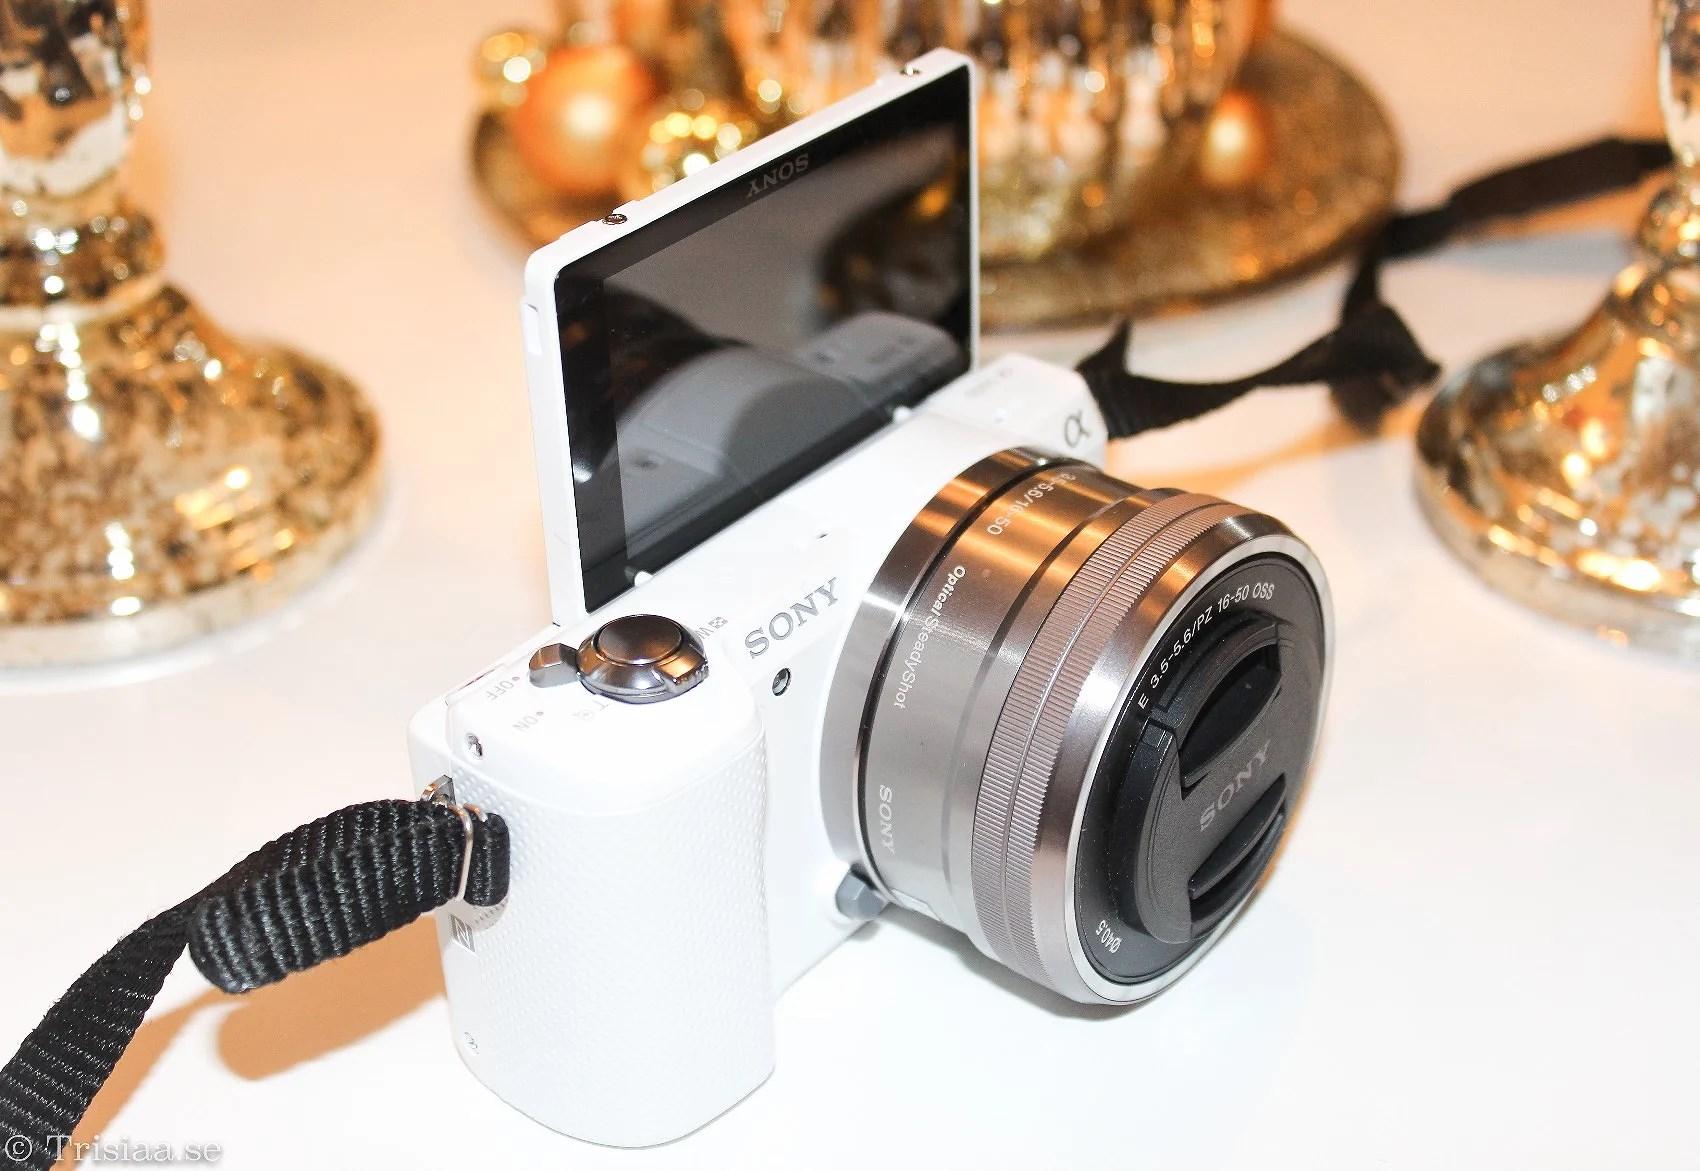 En av mina kameror